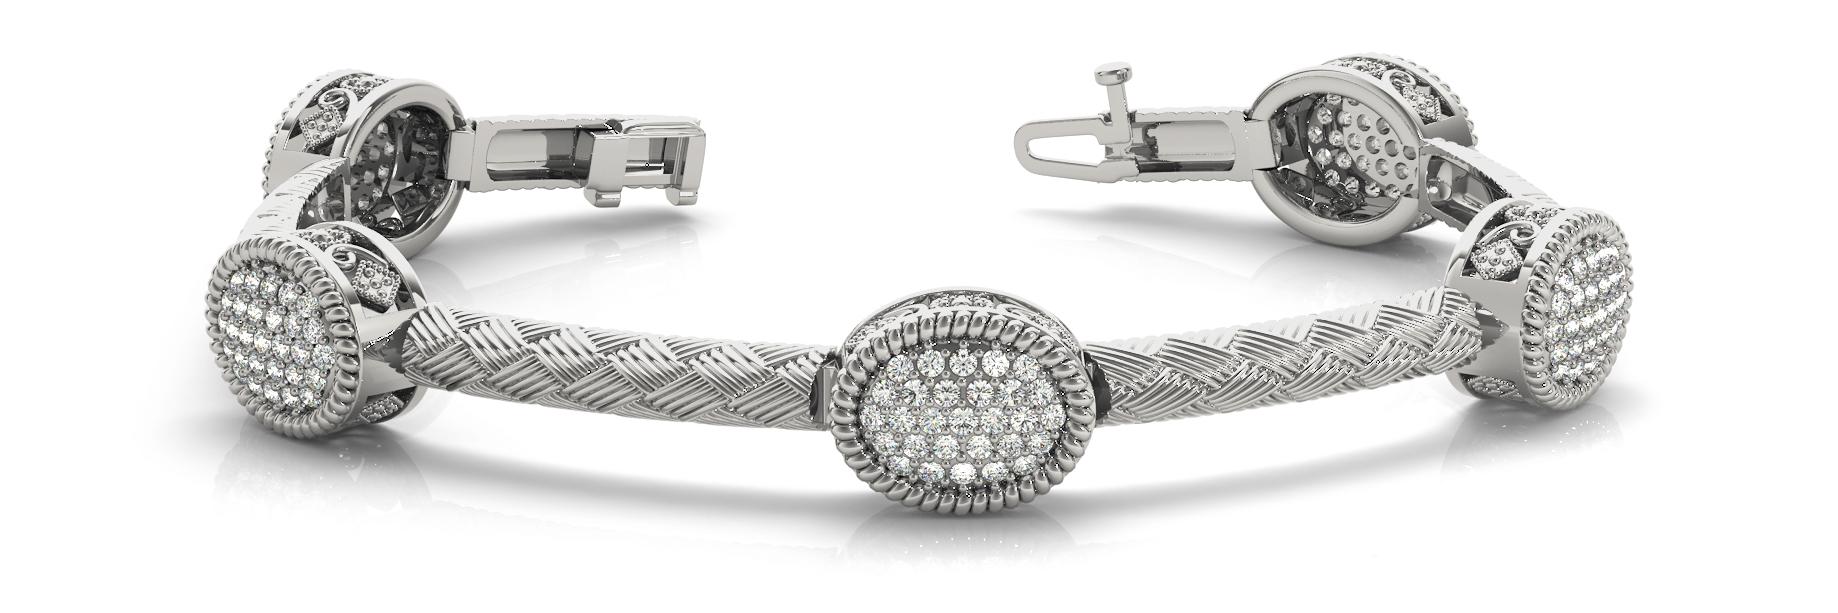 1 3/4 ct tw 14kt gold<br> White Bracelet 145 -<br> .0125PT Round